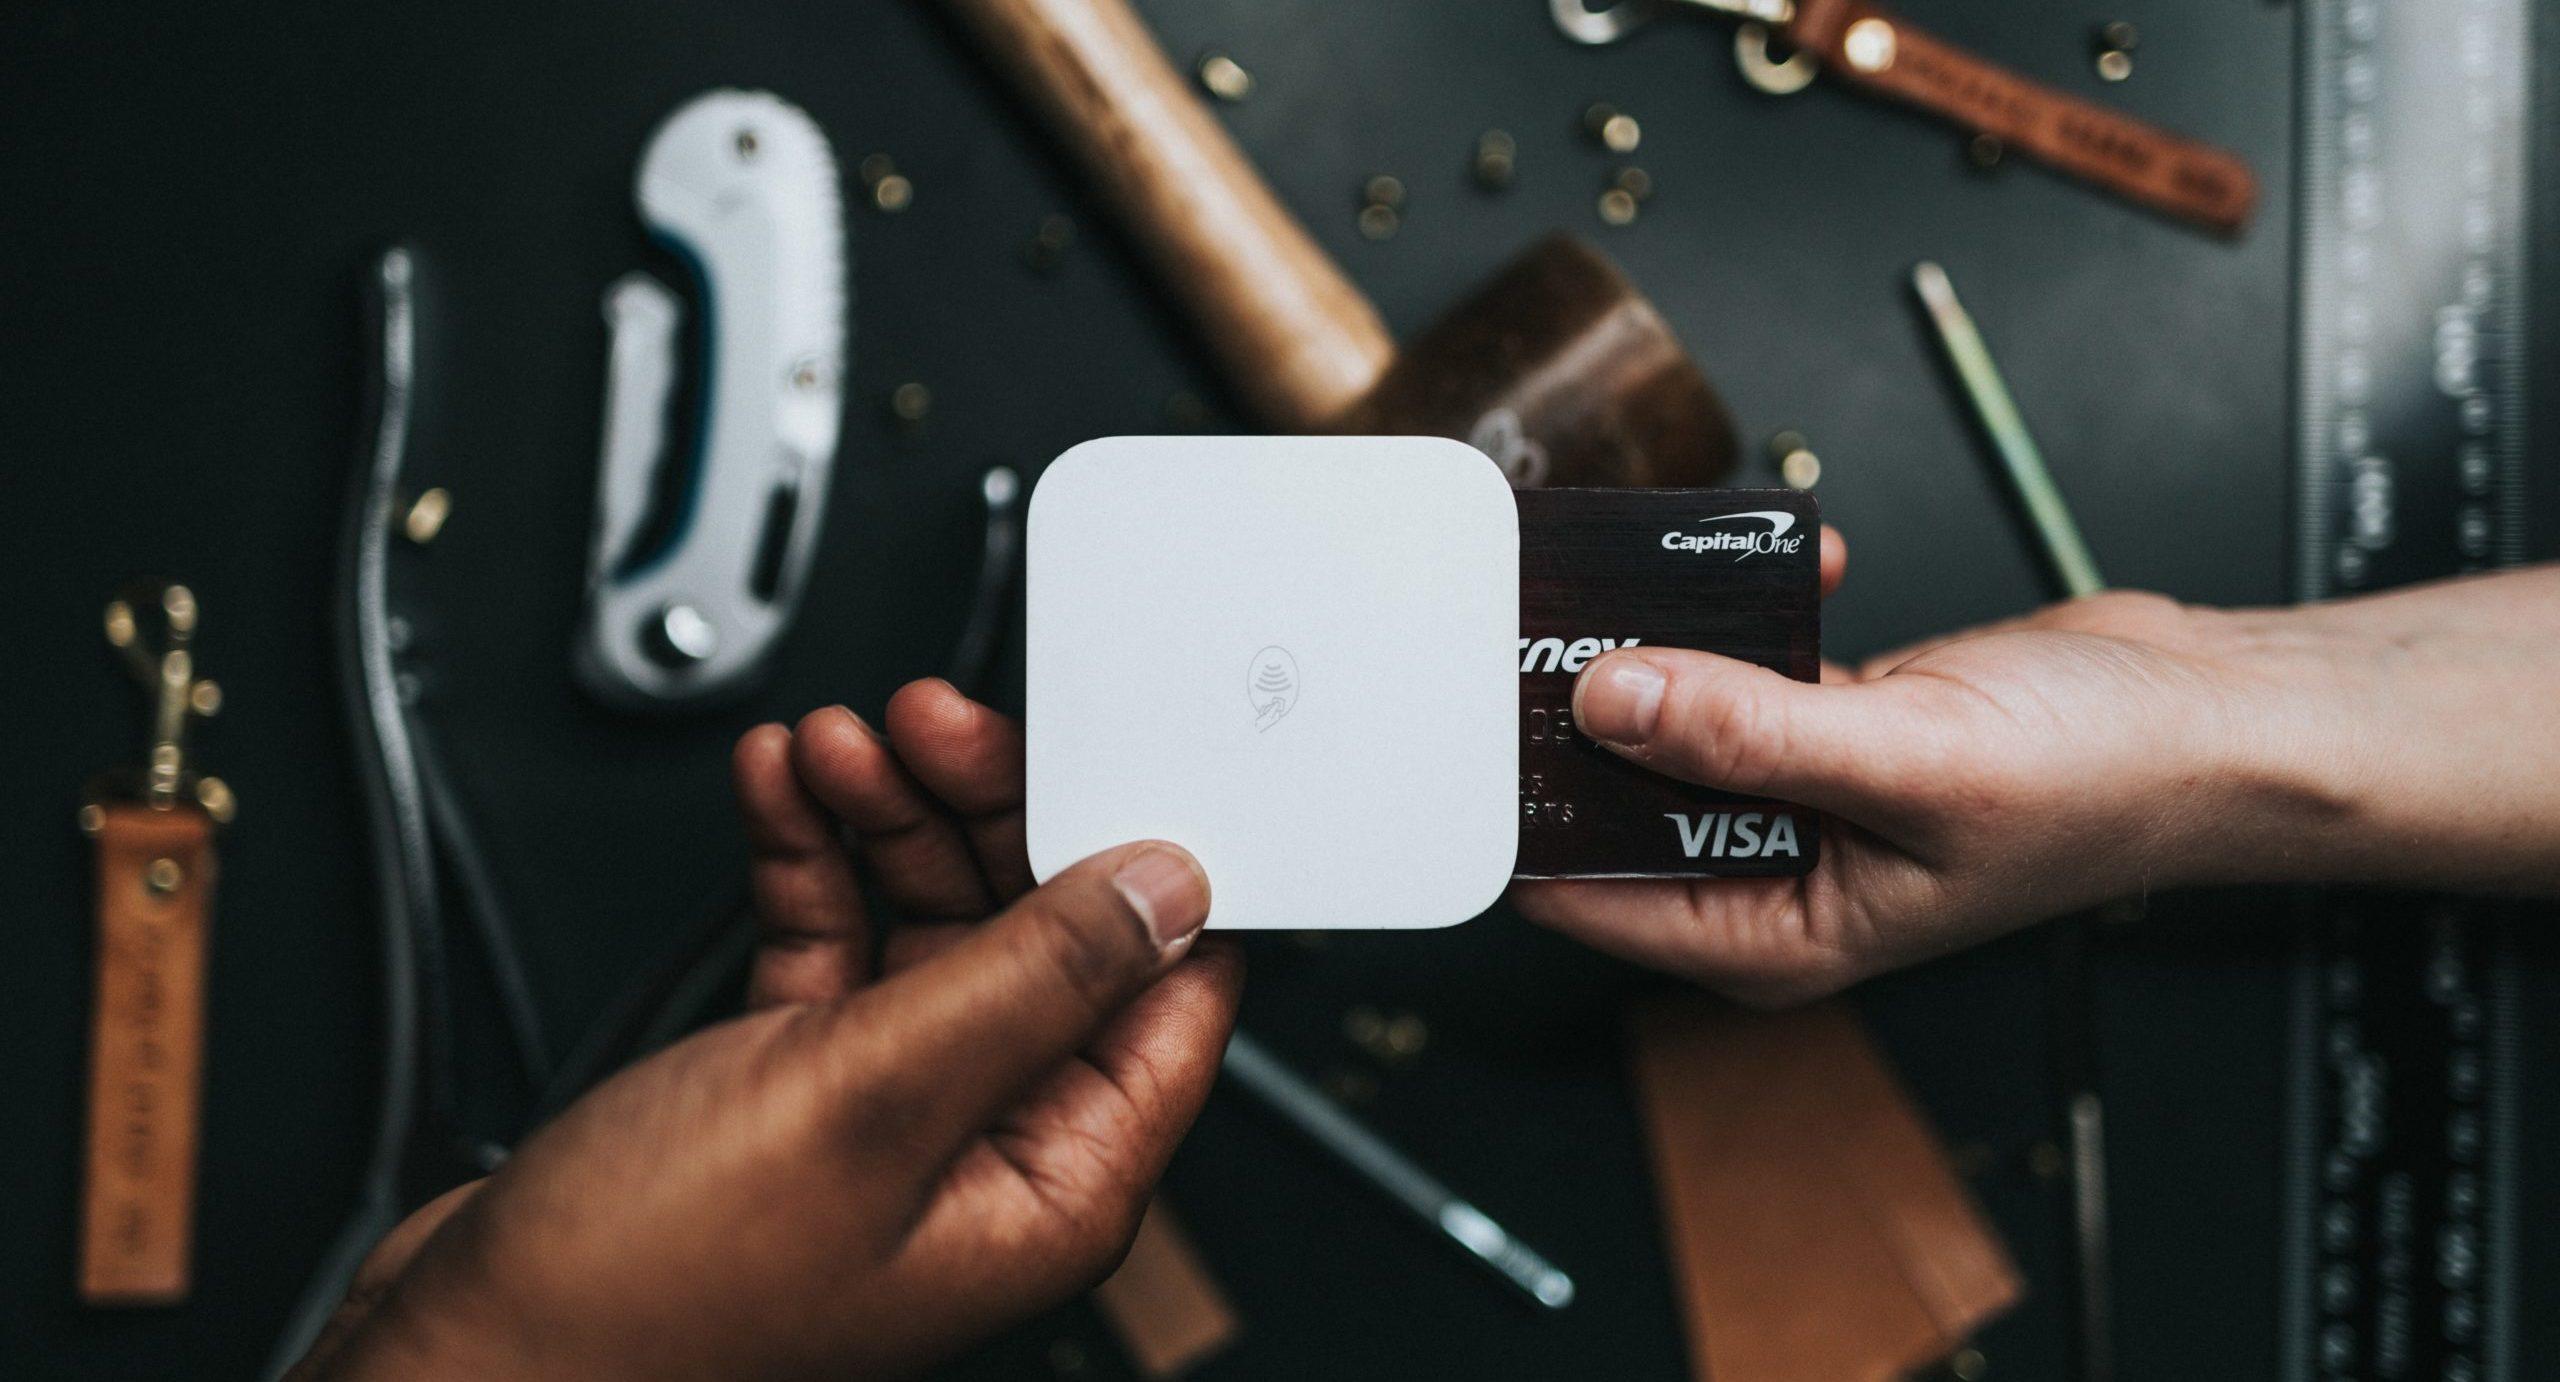 Wider adoption, faster returns – so how do you make IoT pay?